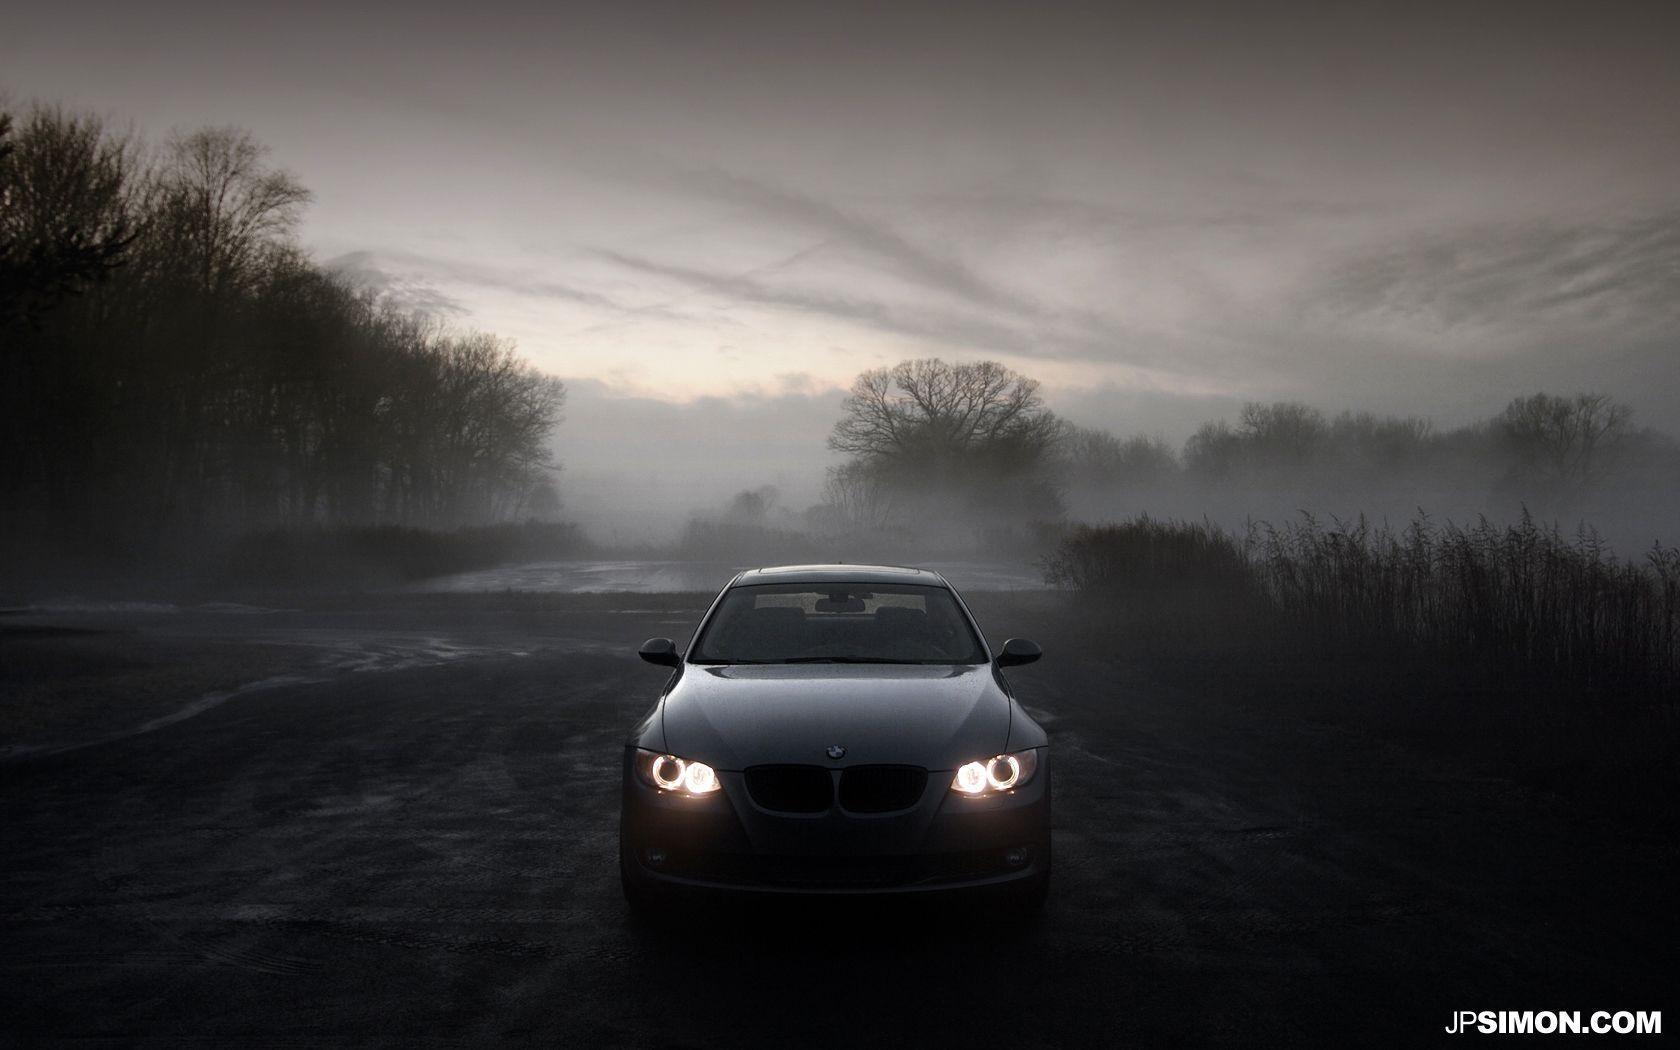 BMW E90 Wallpapers - Wallpaper Cave